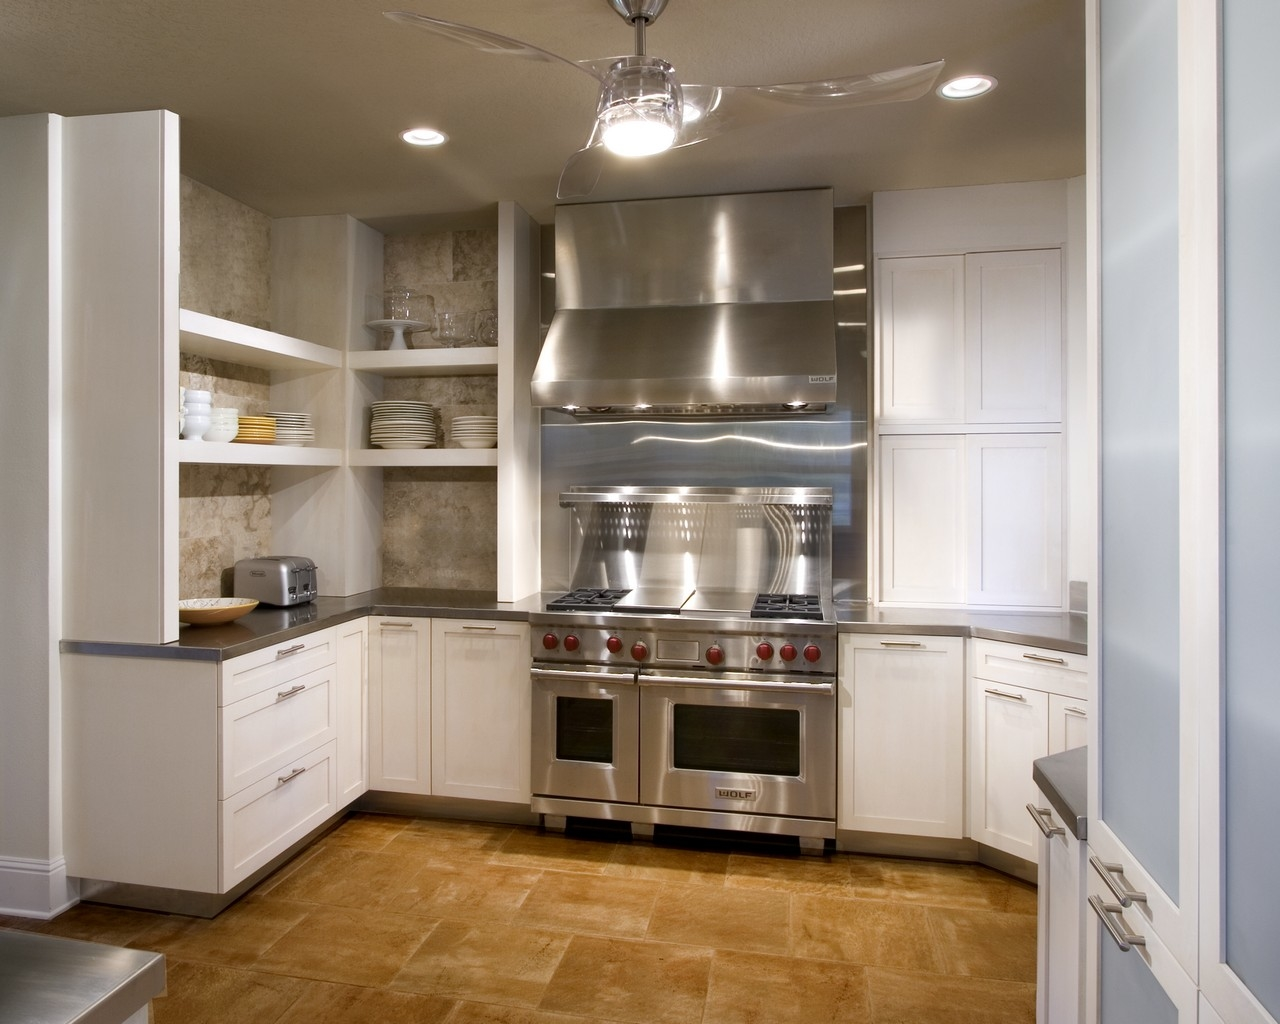 Central Kitchen And Bath. Print. Share. 935 Orange Ave, Suite 102. Winter  Park, FL 32789